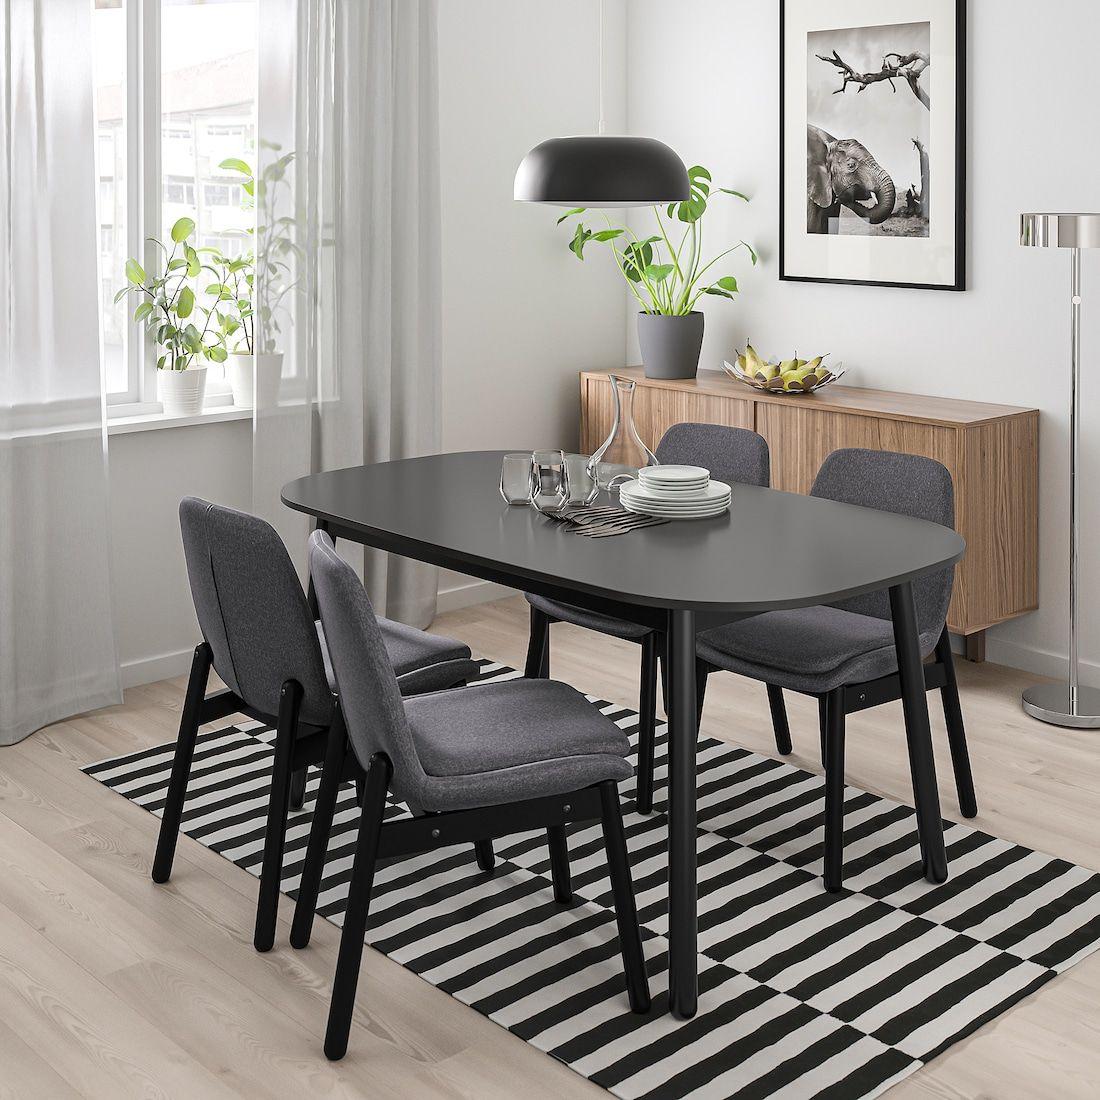 40+ Dining room table sets black friday Best Seller